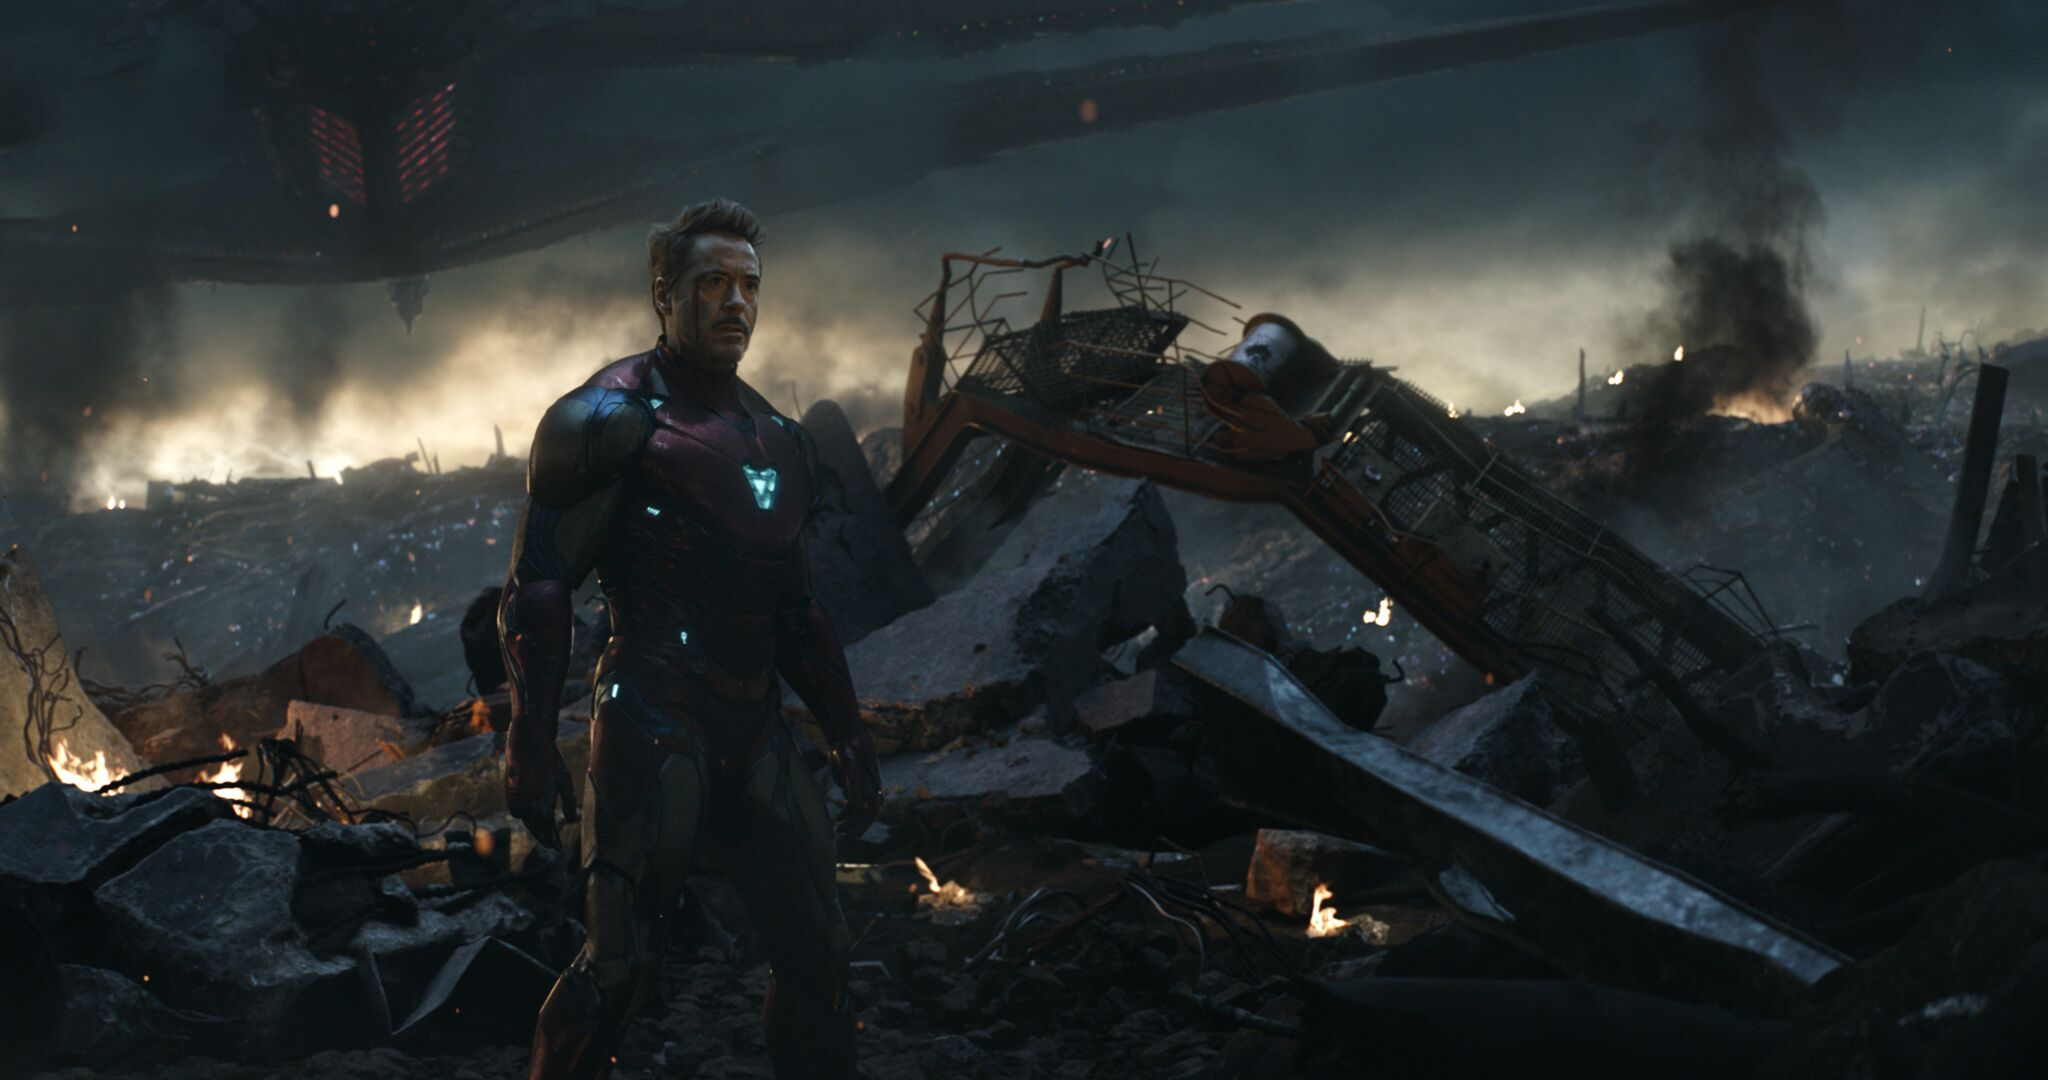 Robert Downey Jr. to return as Tony Stark in Black Widow movie